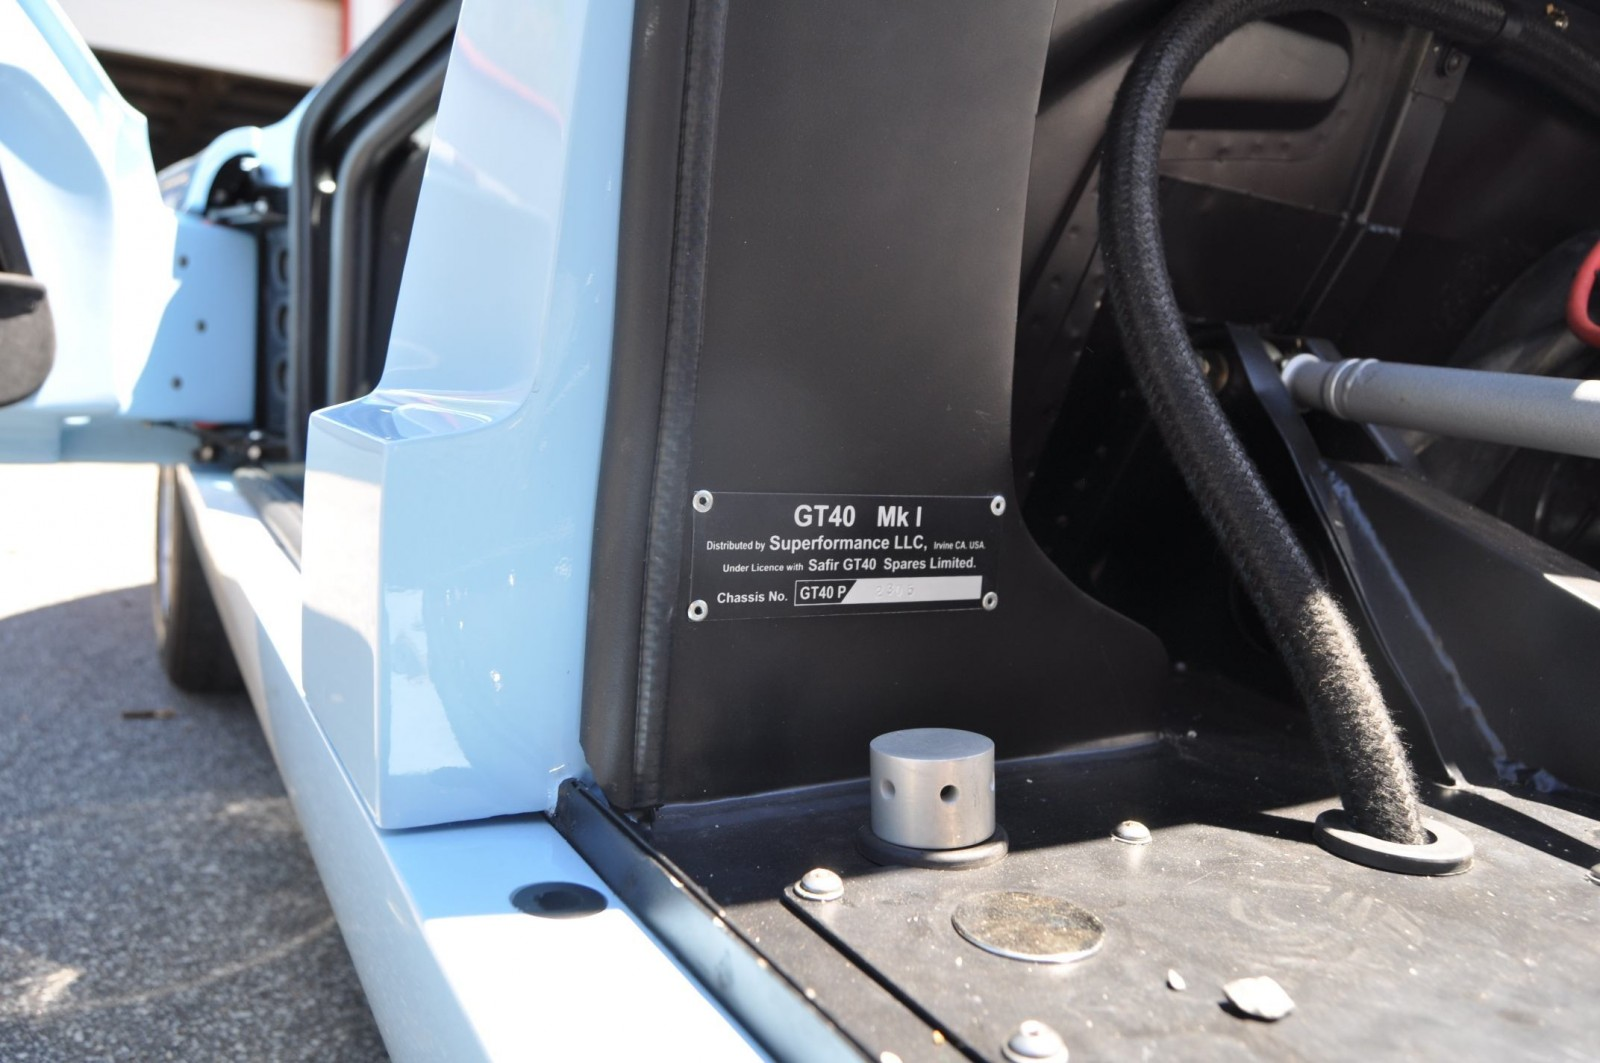 2014 Superformance GT40 Mark I - MEGA Photo Shoot and Ride-Along Videos 52